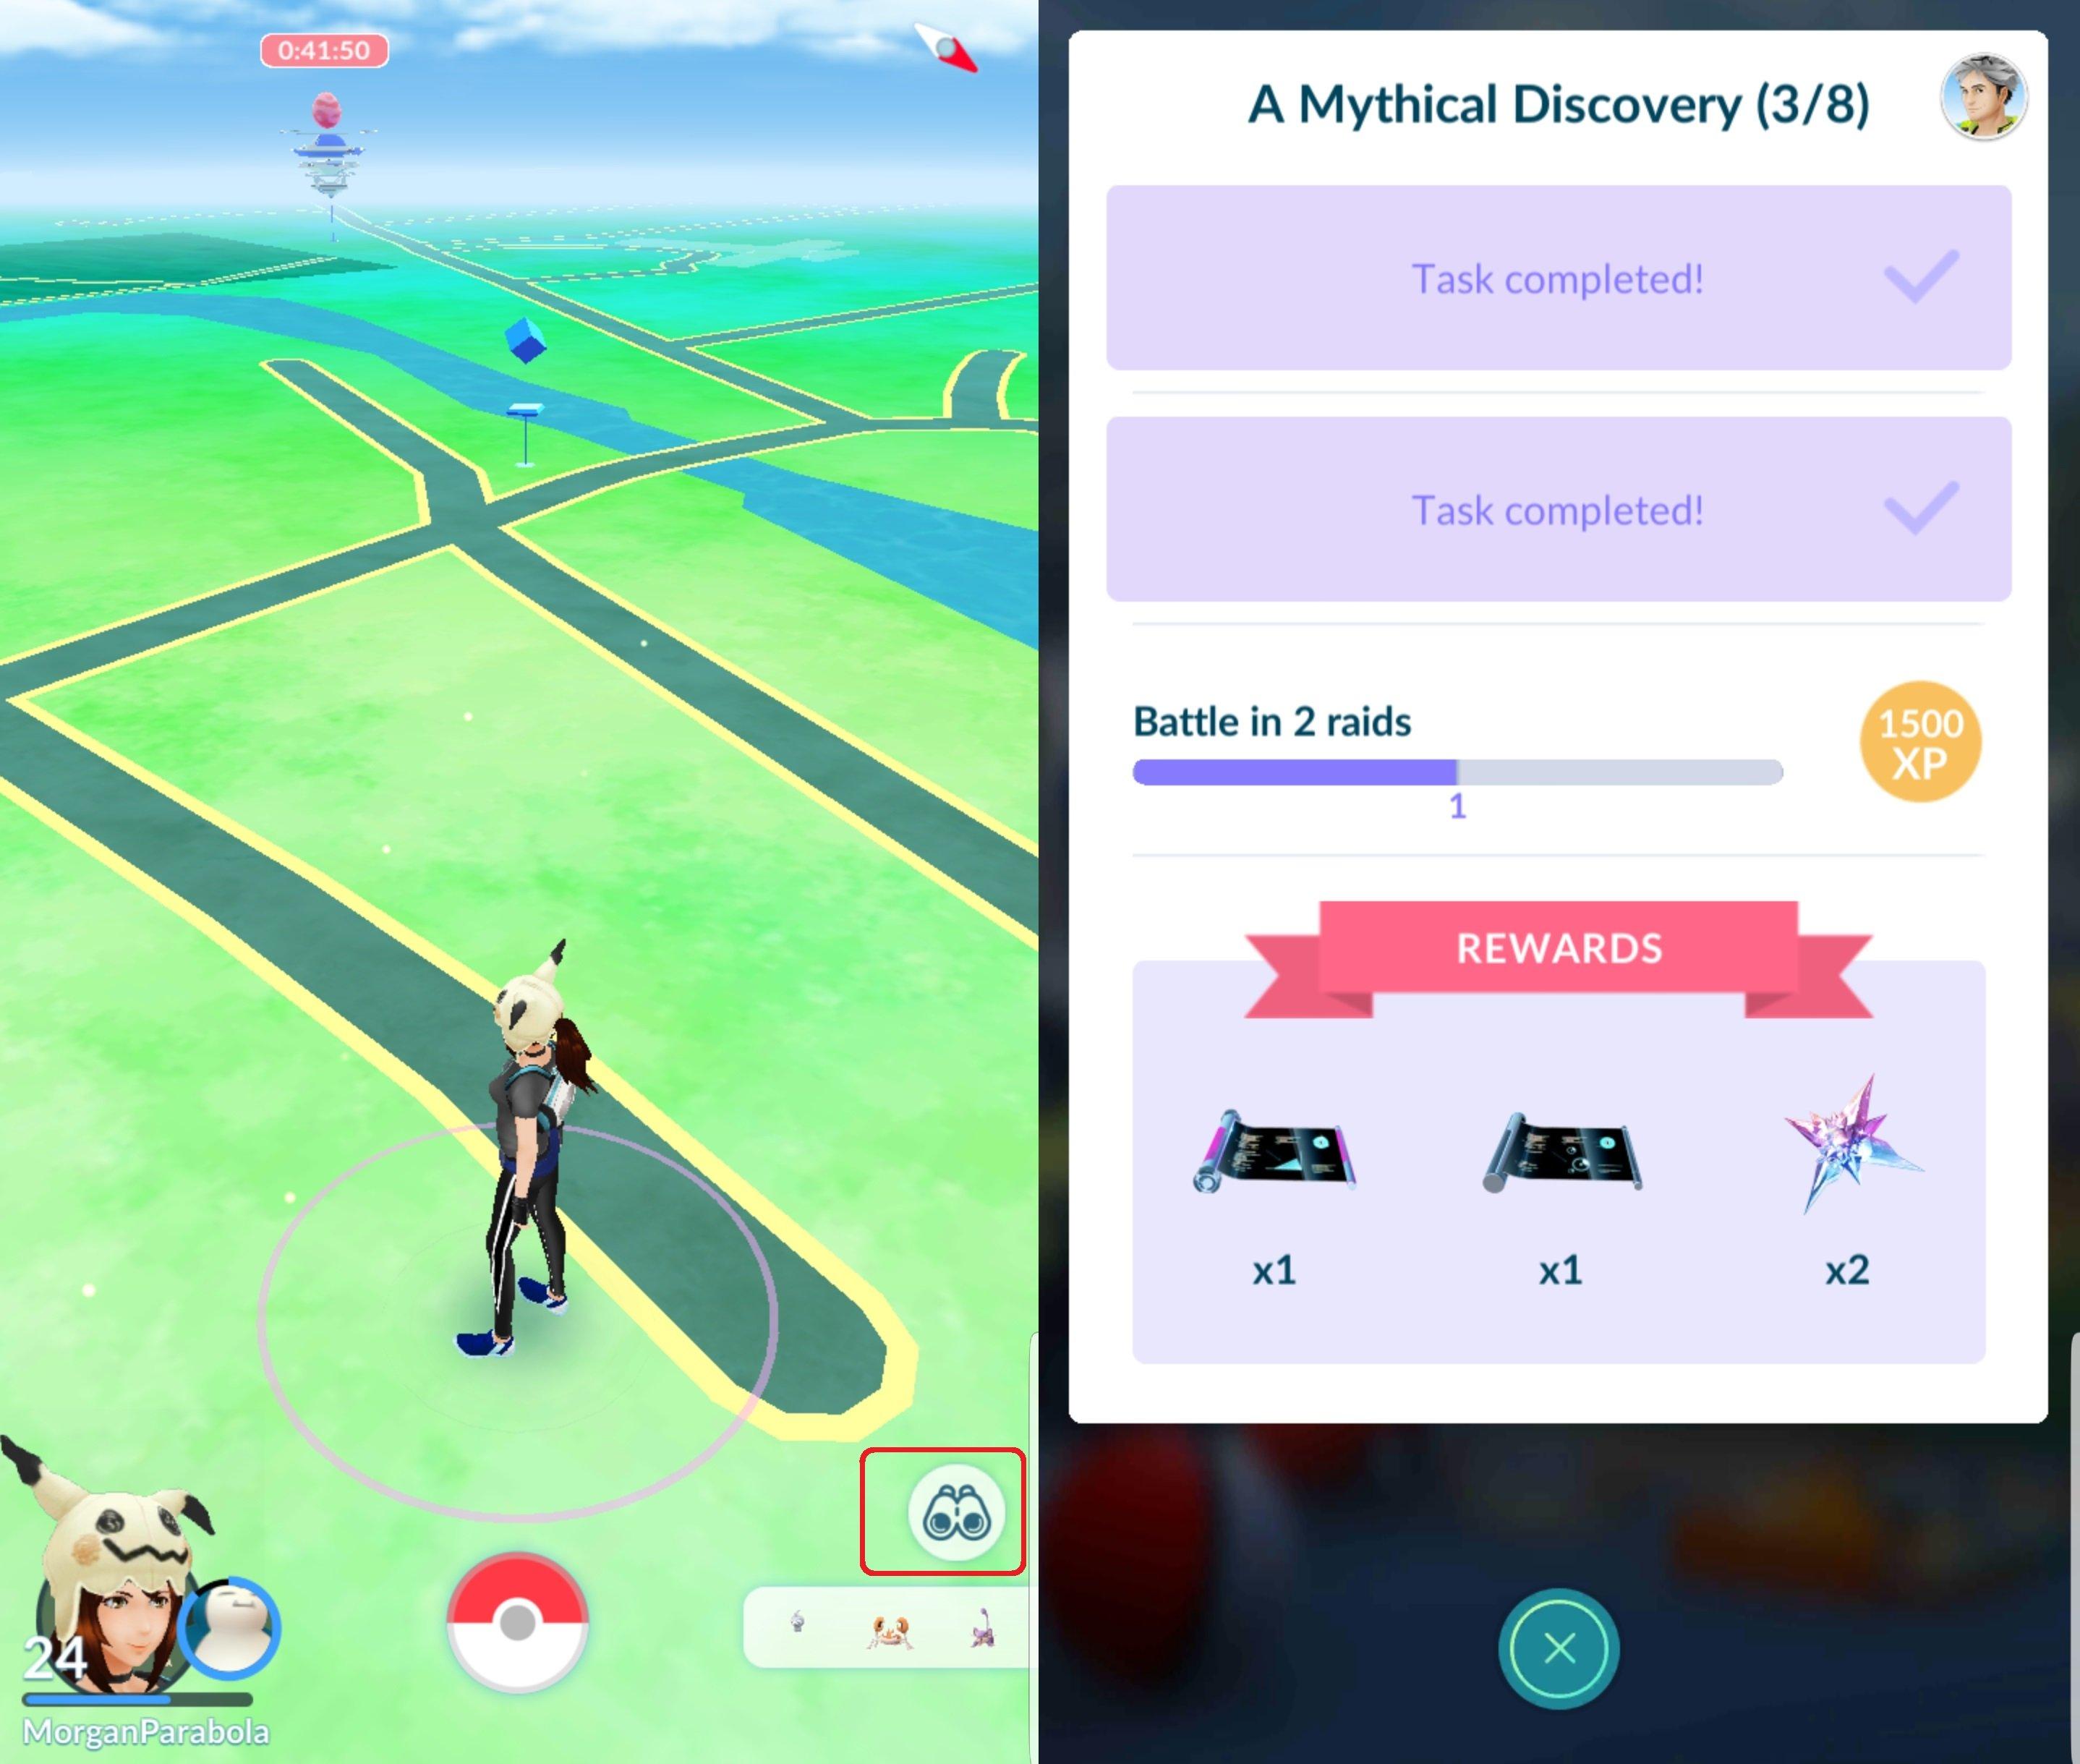 pokemon go mythical discovery